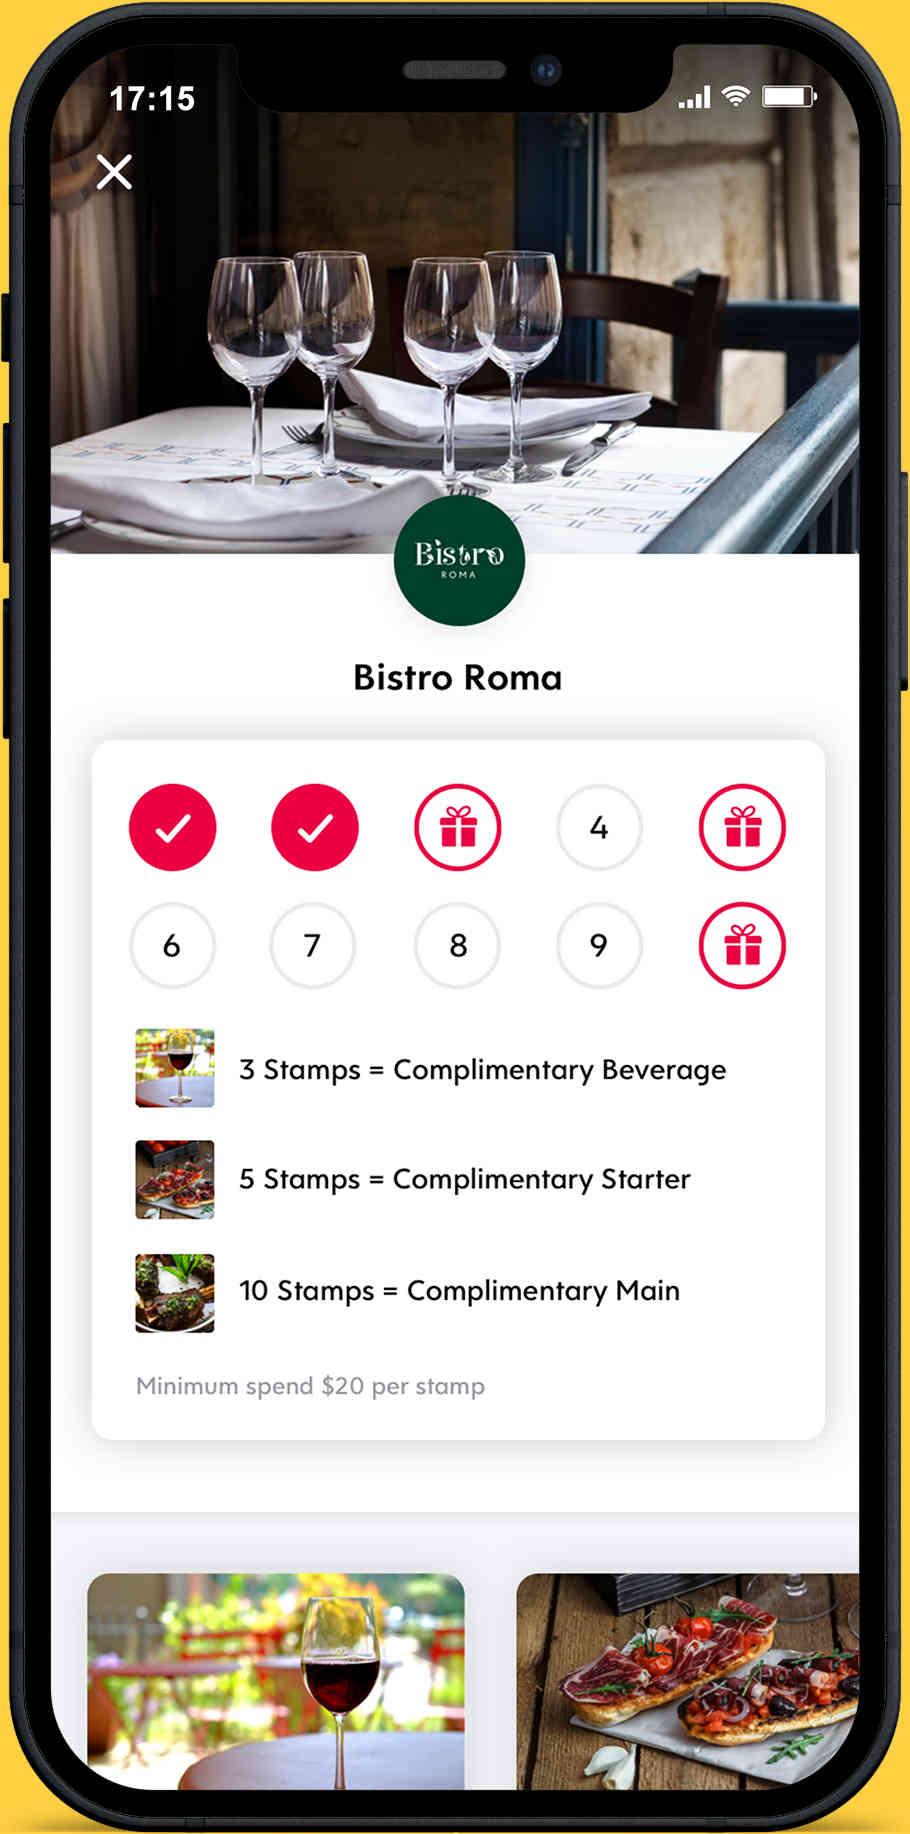 Screenshot of Flex Rewards Digital Loyalty Card for Bistro Roma